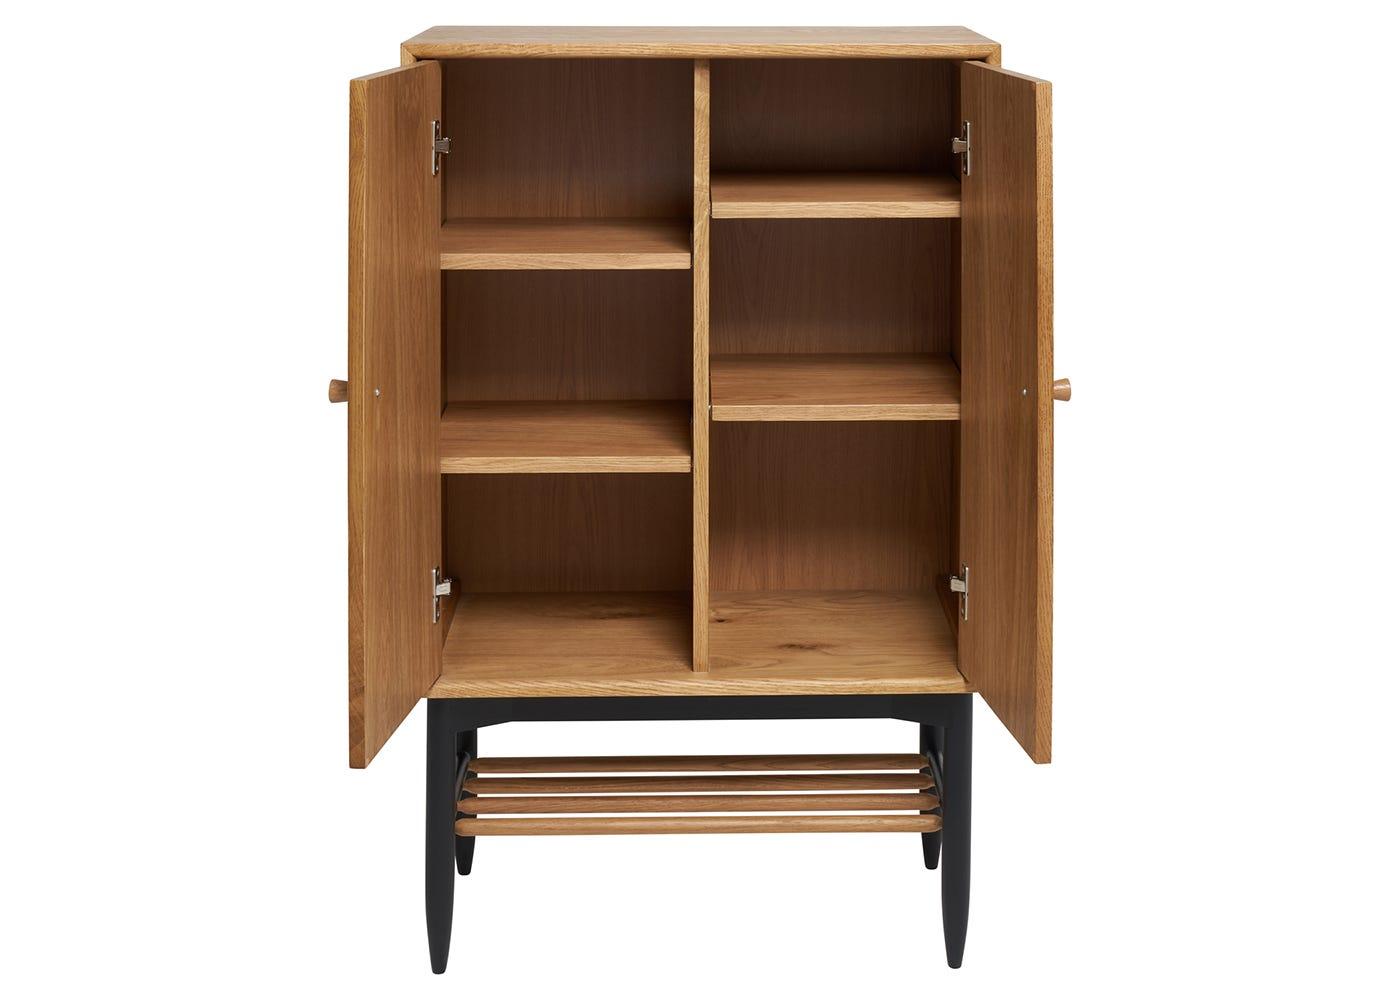 Monza Universal Cabinet - Open View